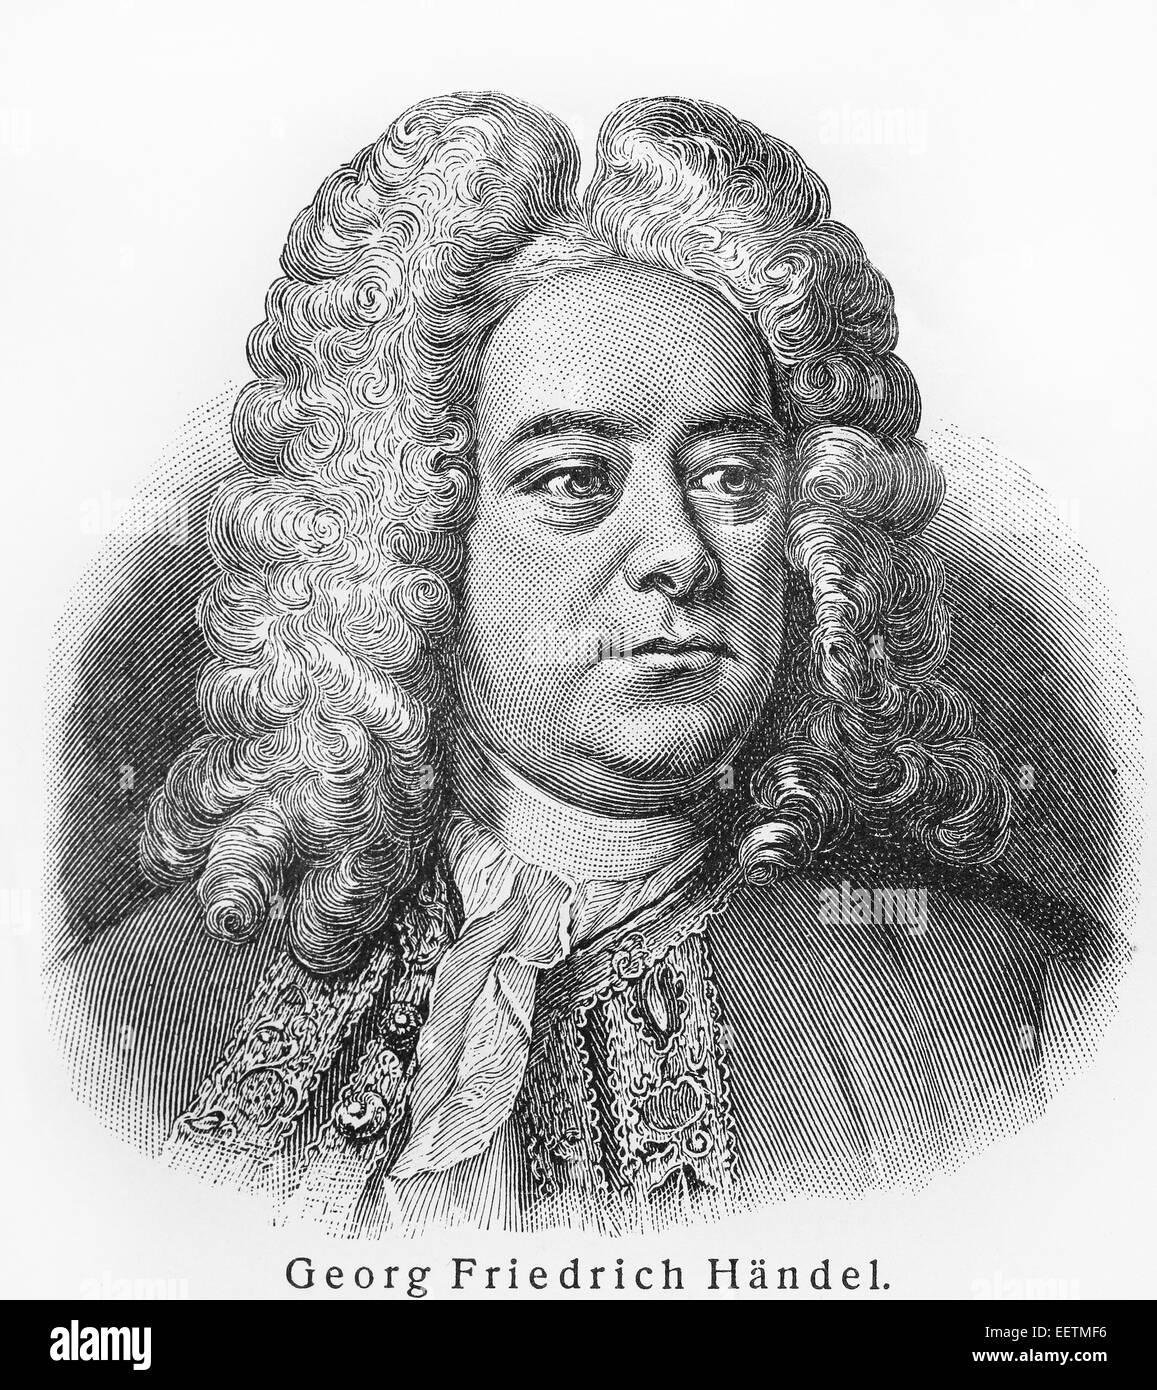 Georg Friedrich Händel Stockbild